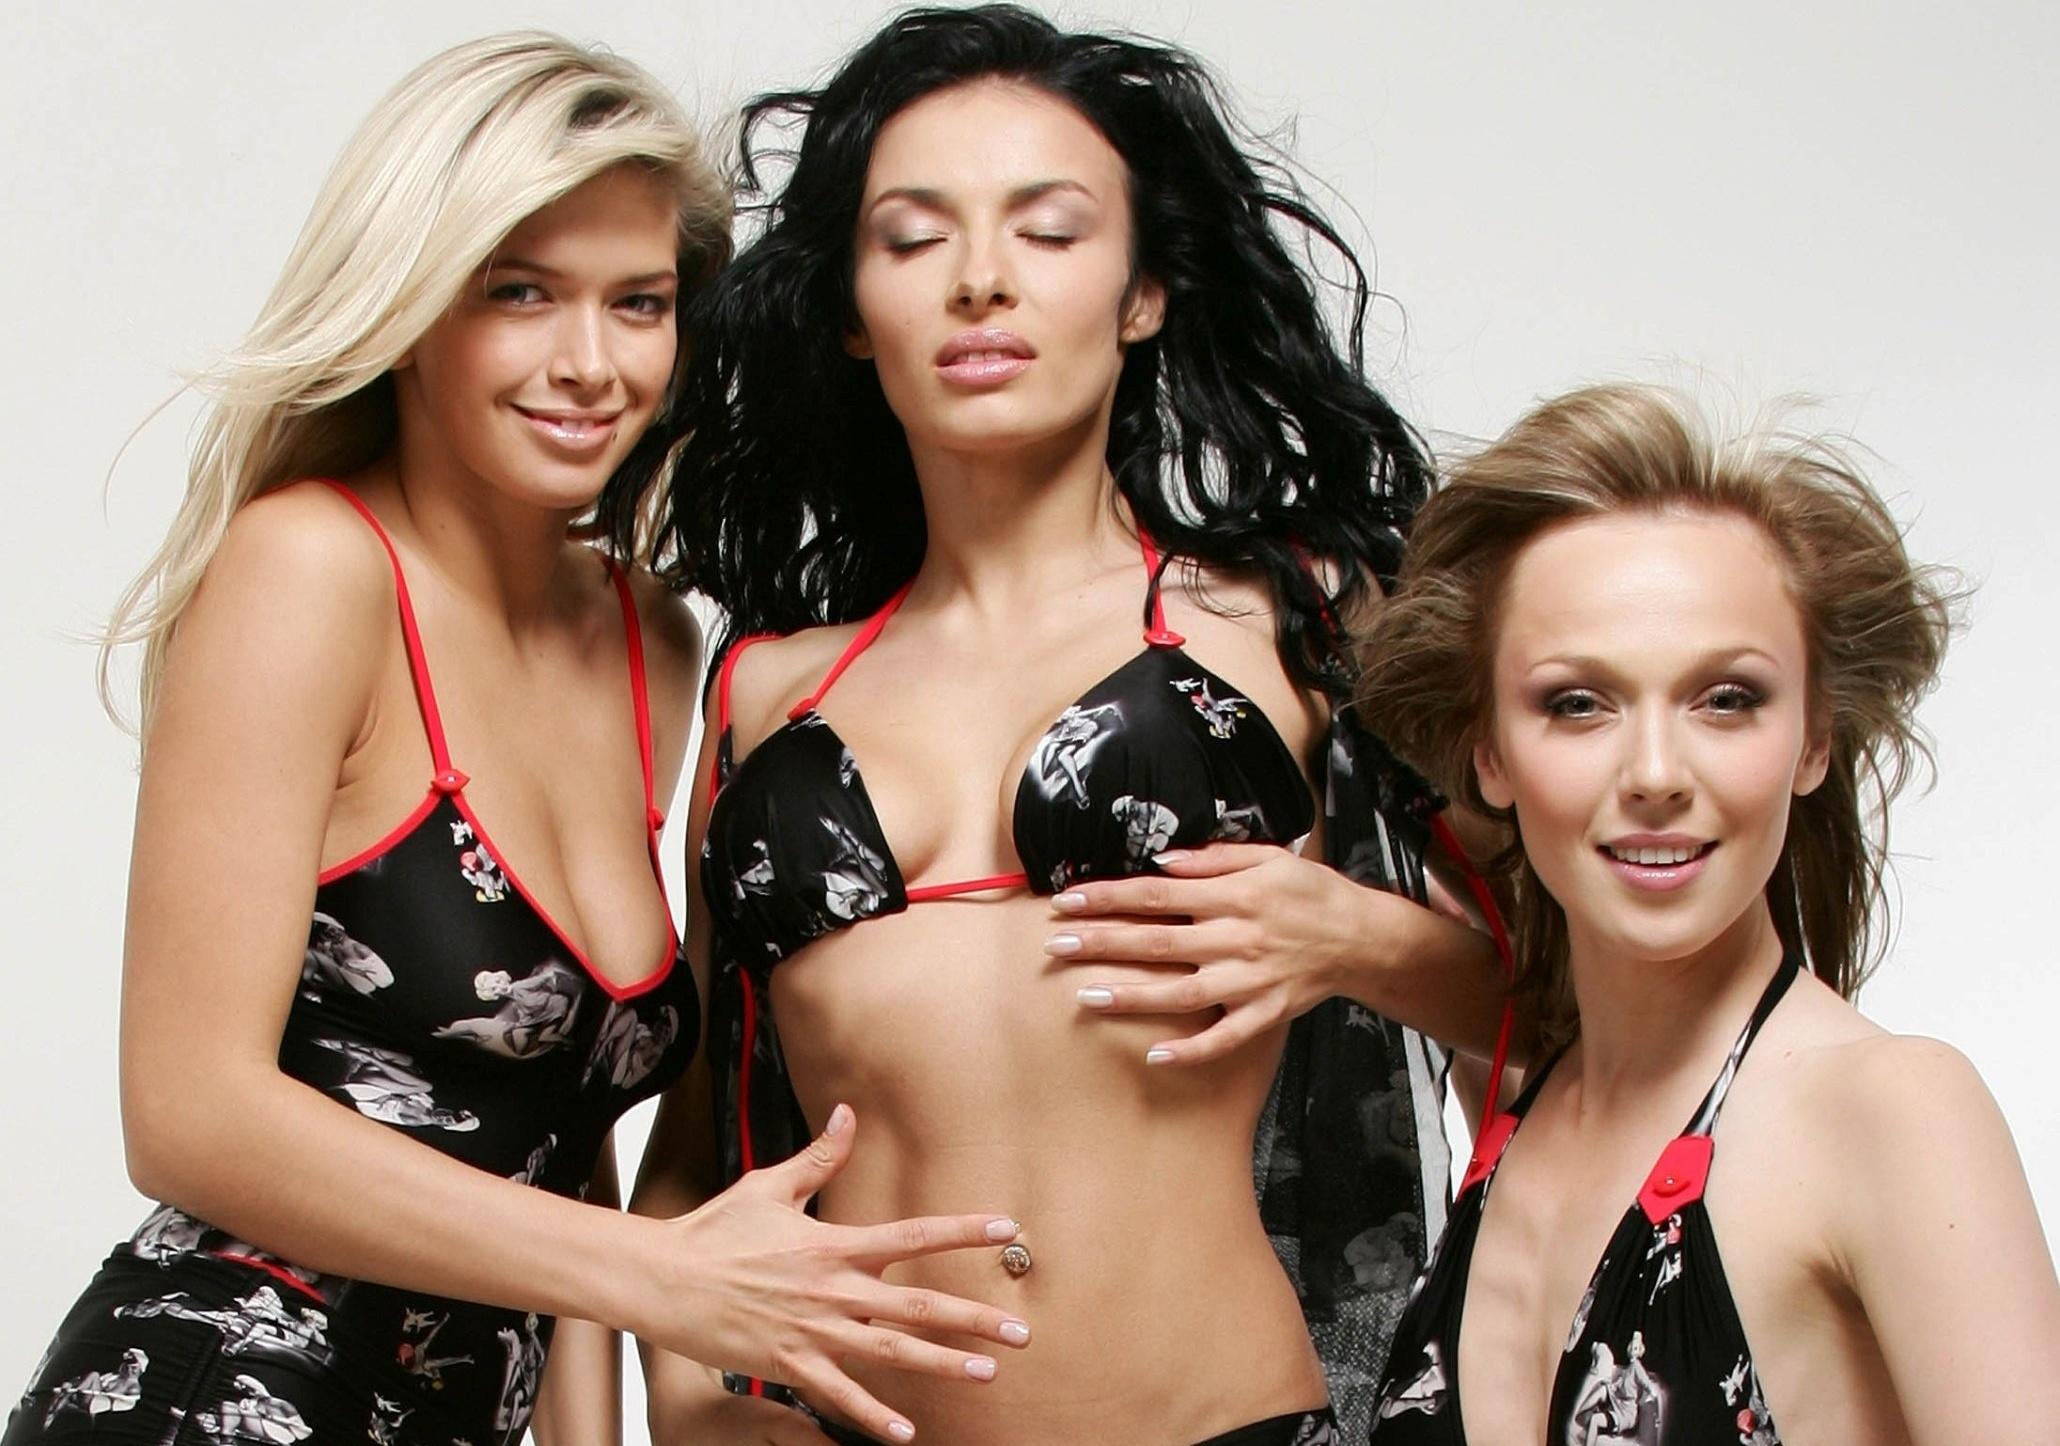 samie-seksualnie-klipi-gruppi-viagra